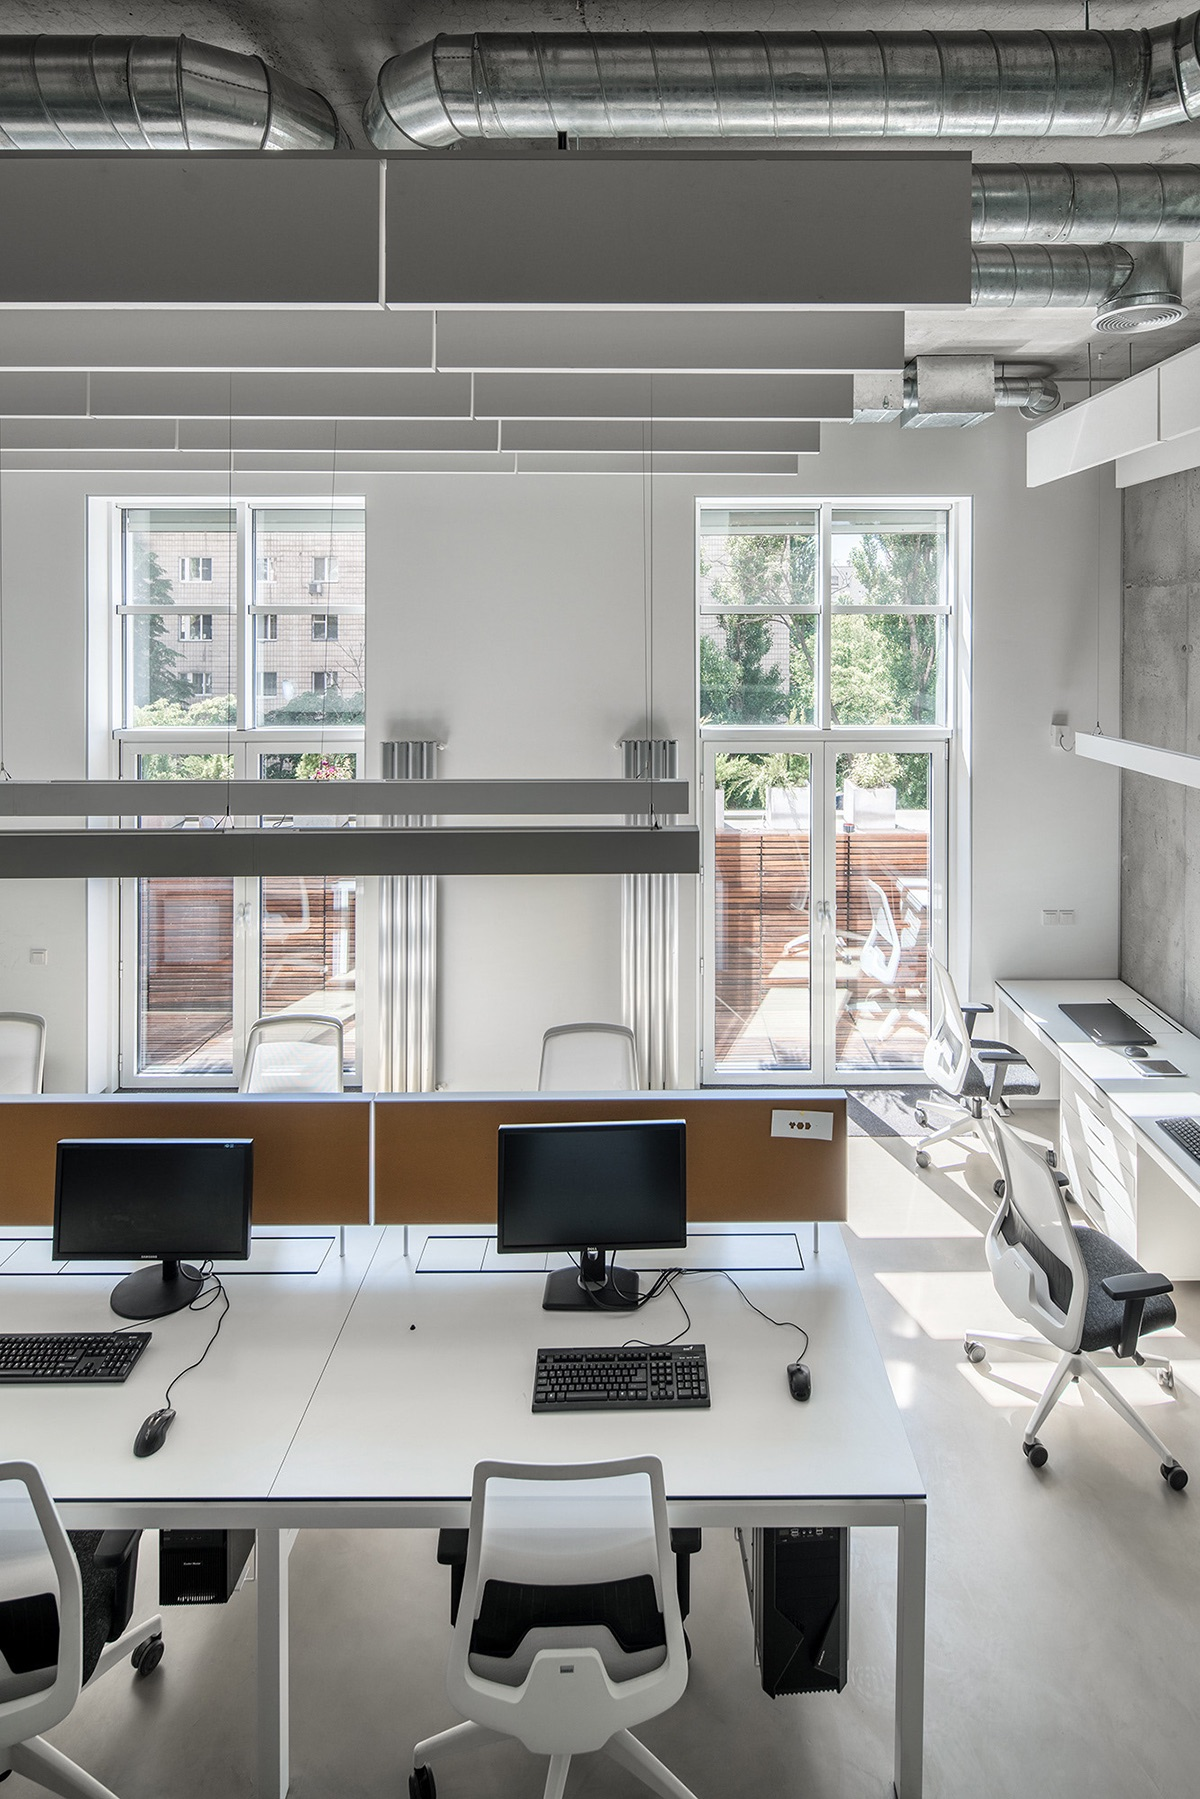 yod-design-lab-office-7